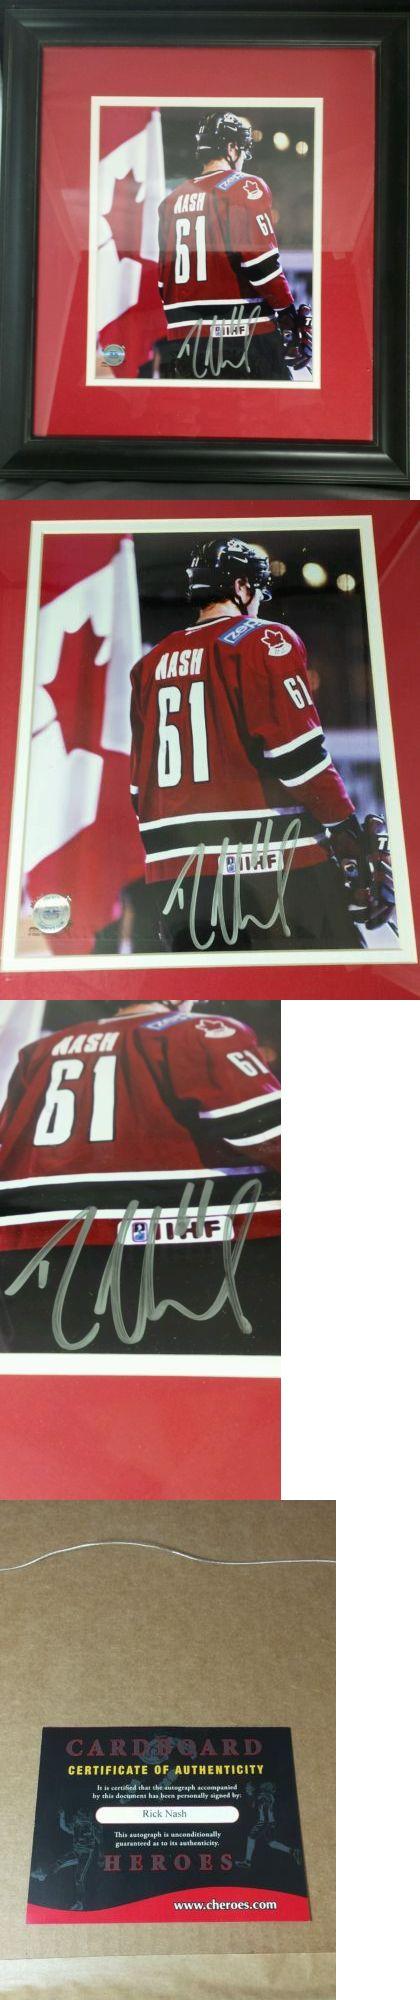 Hockey-Team Canada 2868: Team Canada Rick Nash Autographed Photo - Framed W Coa! New York Rangers Star! -> BUY IT NOW ONLY: $49.99 on eBay!